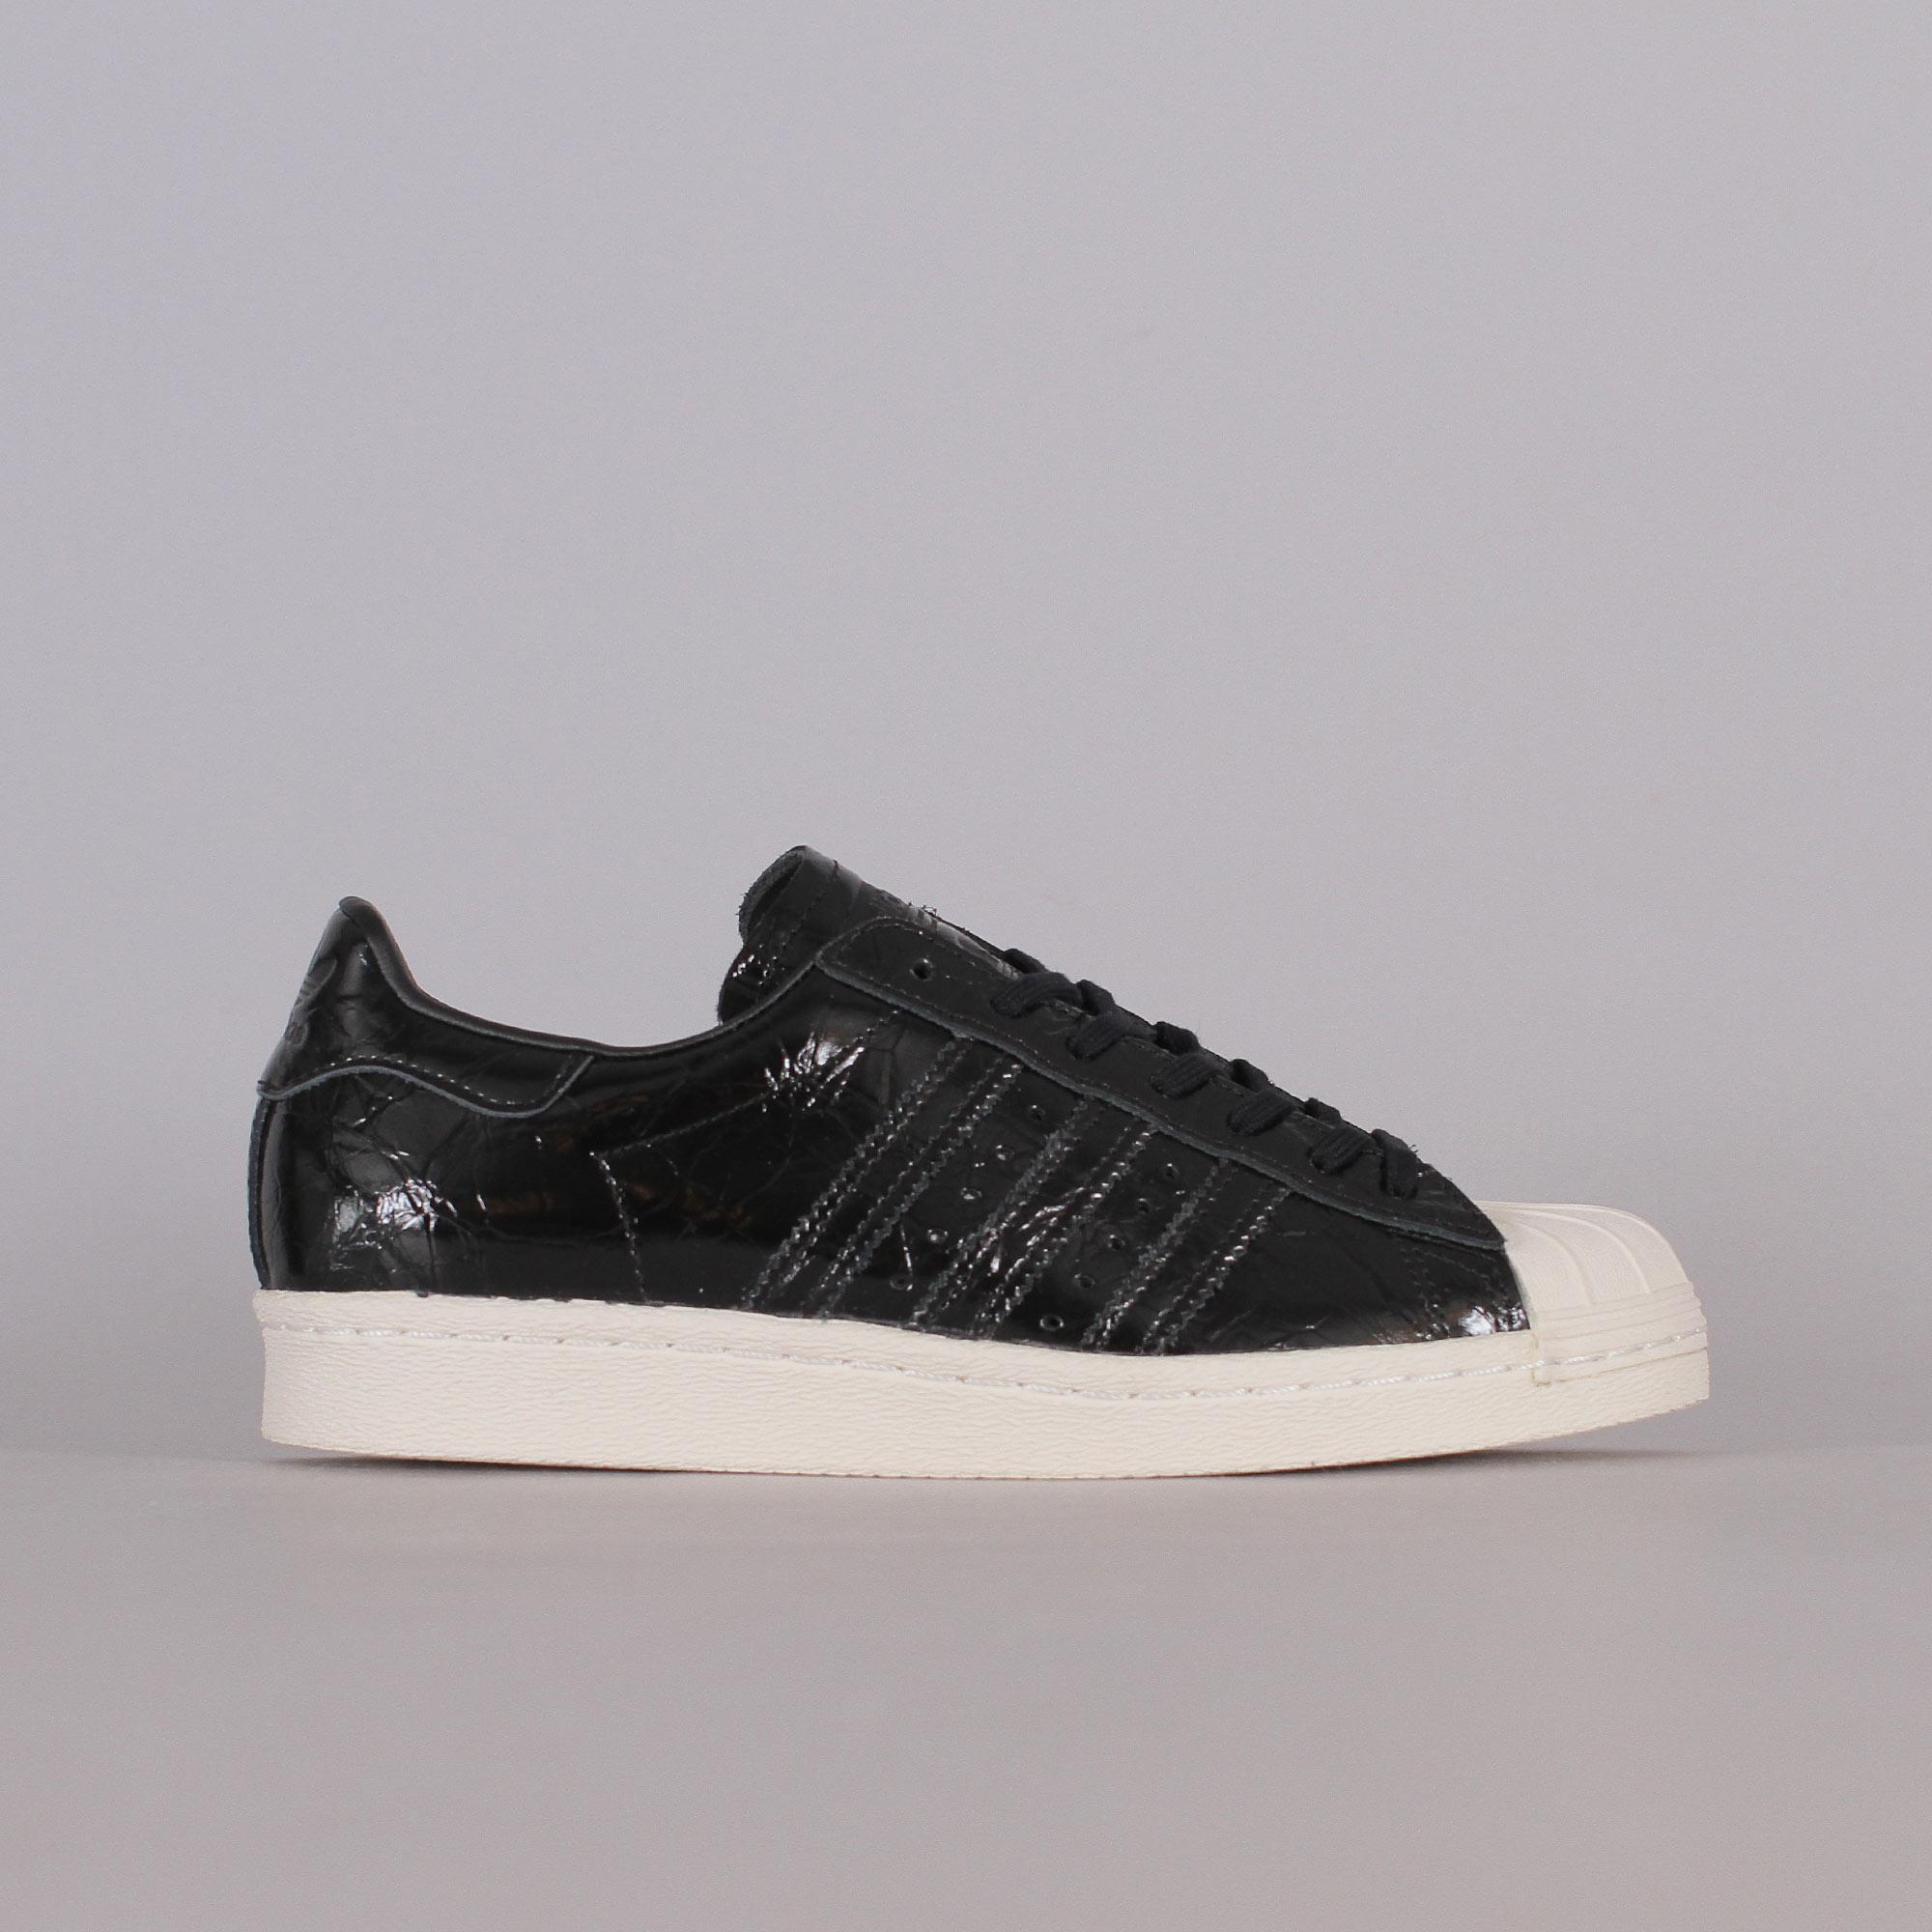 My Adidas Superstars | Superstar outfit, Adidas superstar